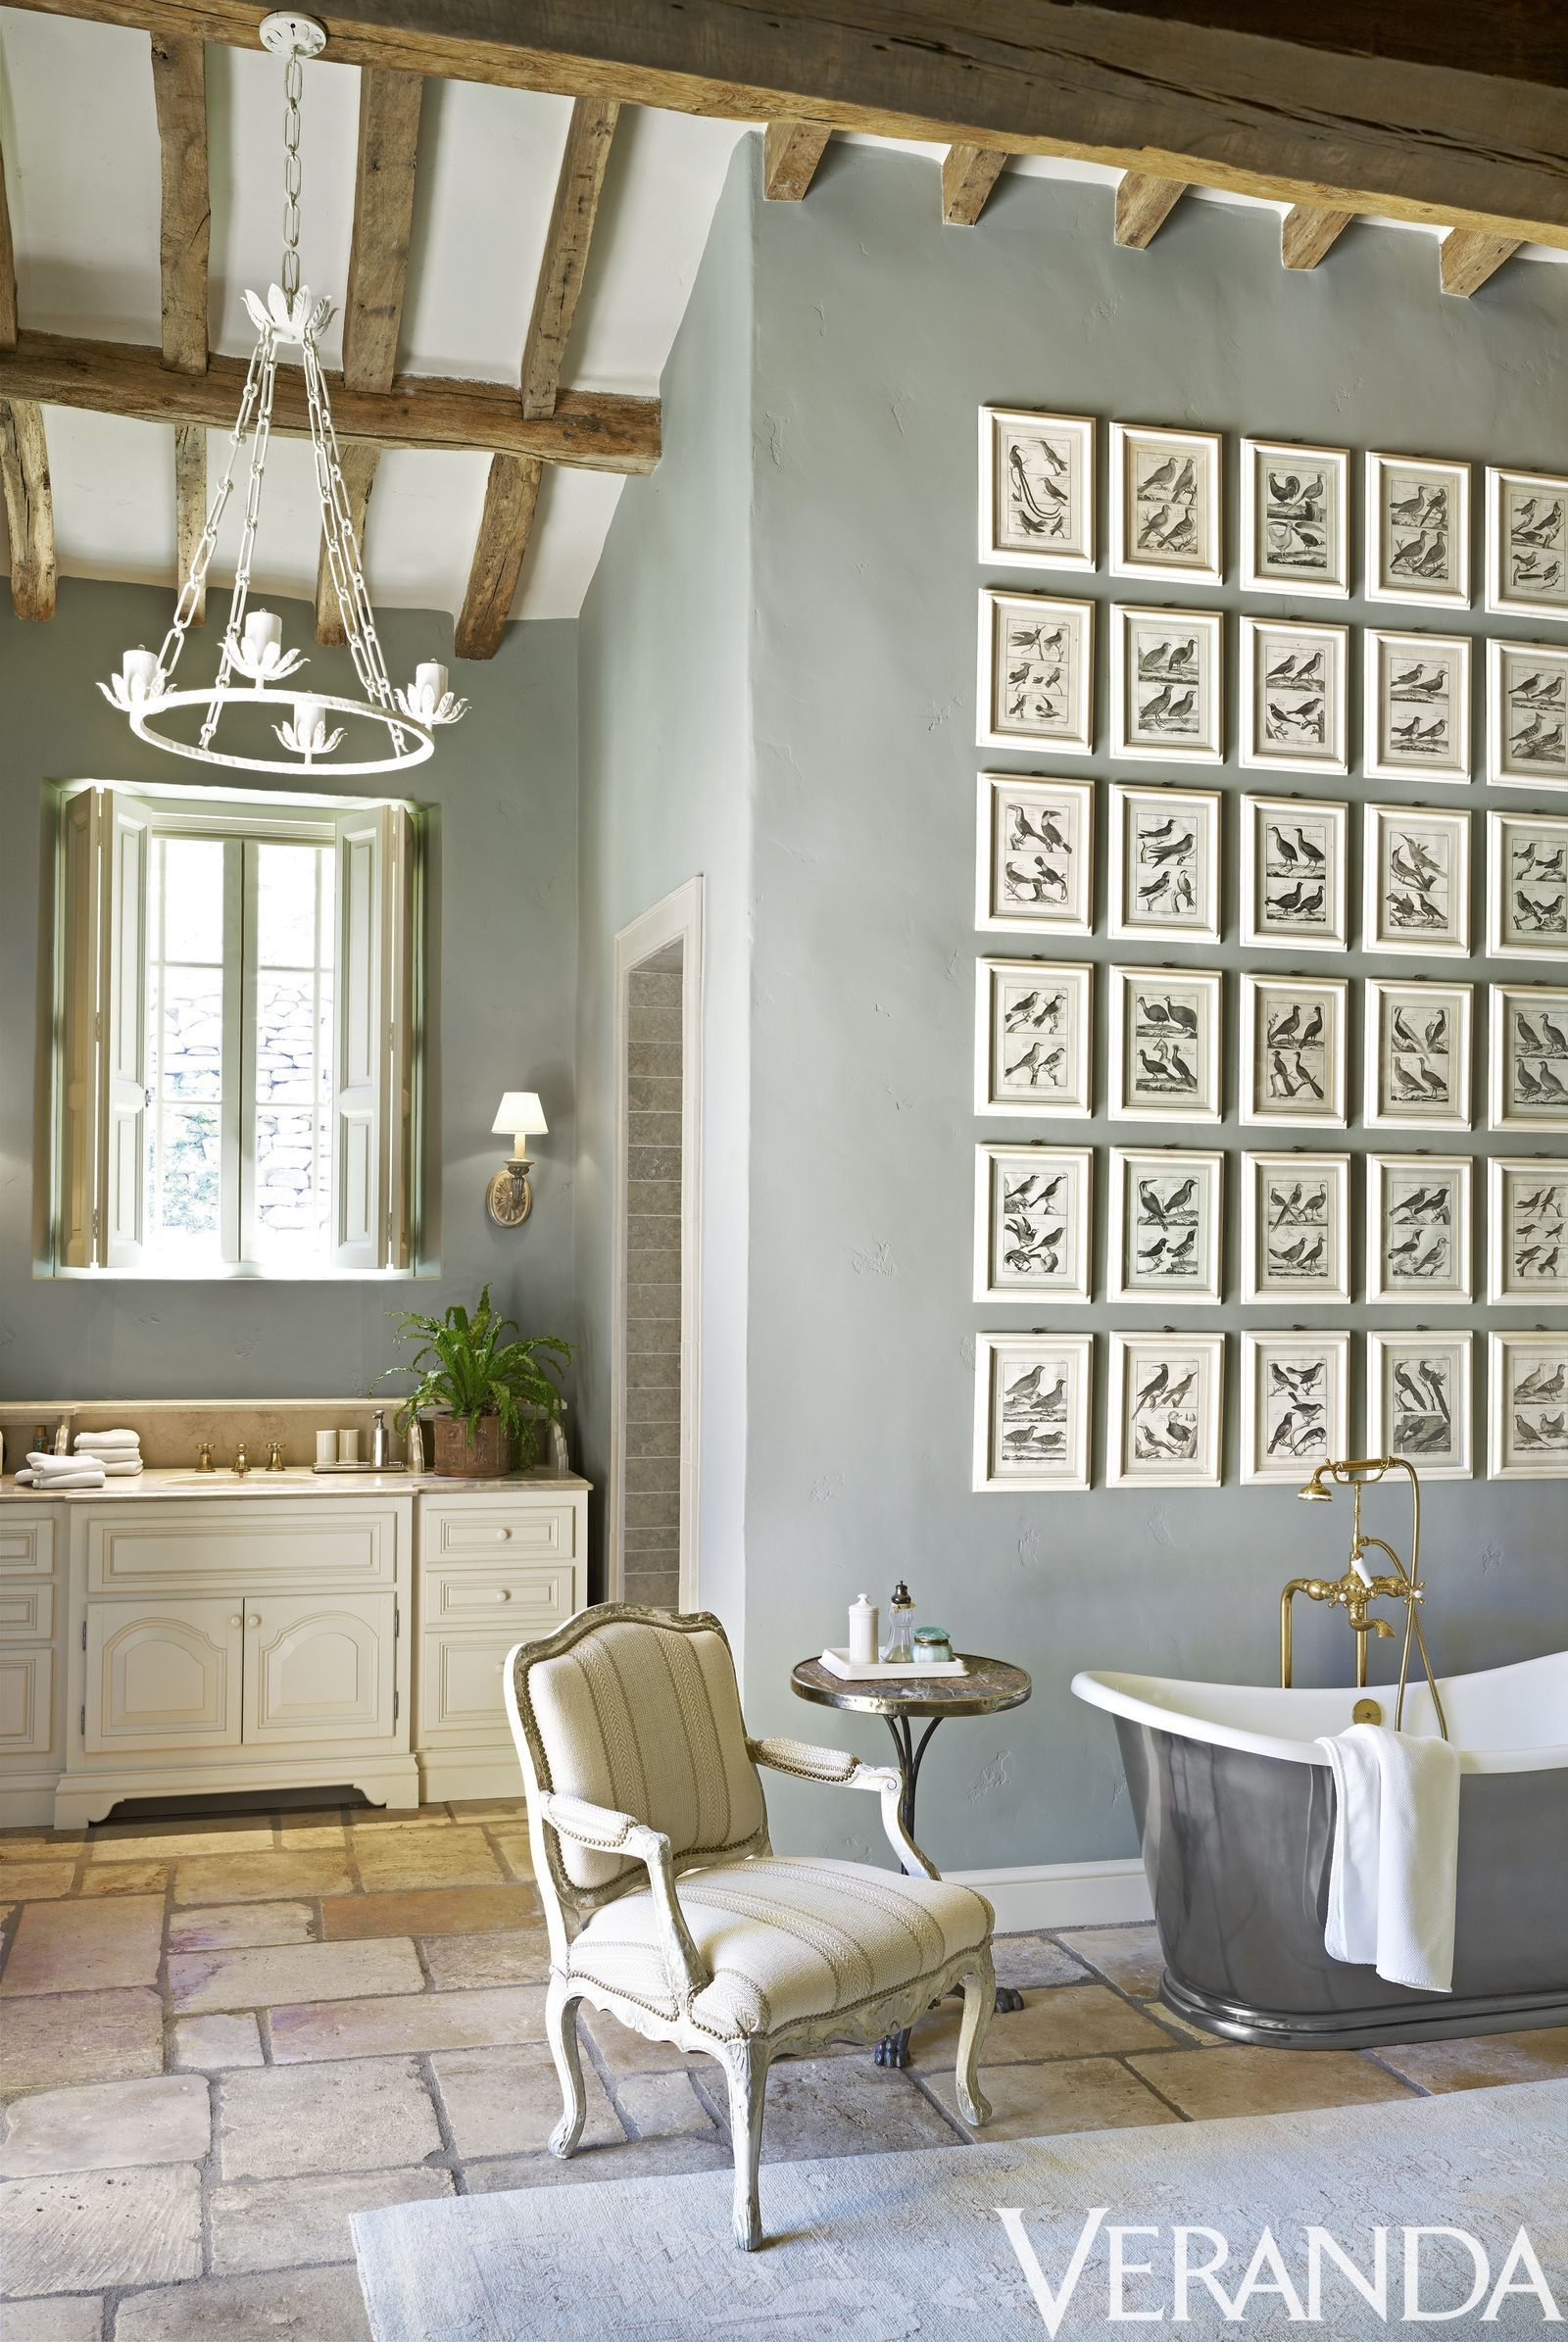 35+ Beautiful Bathroom Decorating Ideas | Decor styles, Rustic decor ...